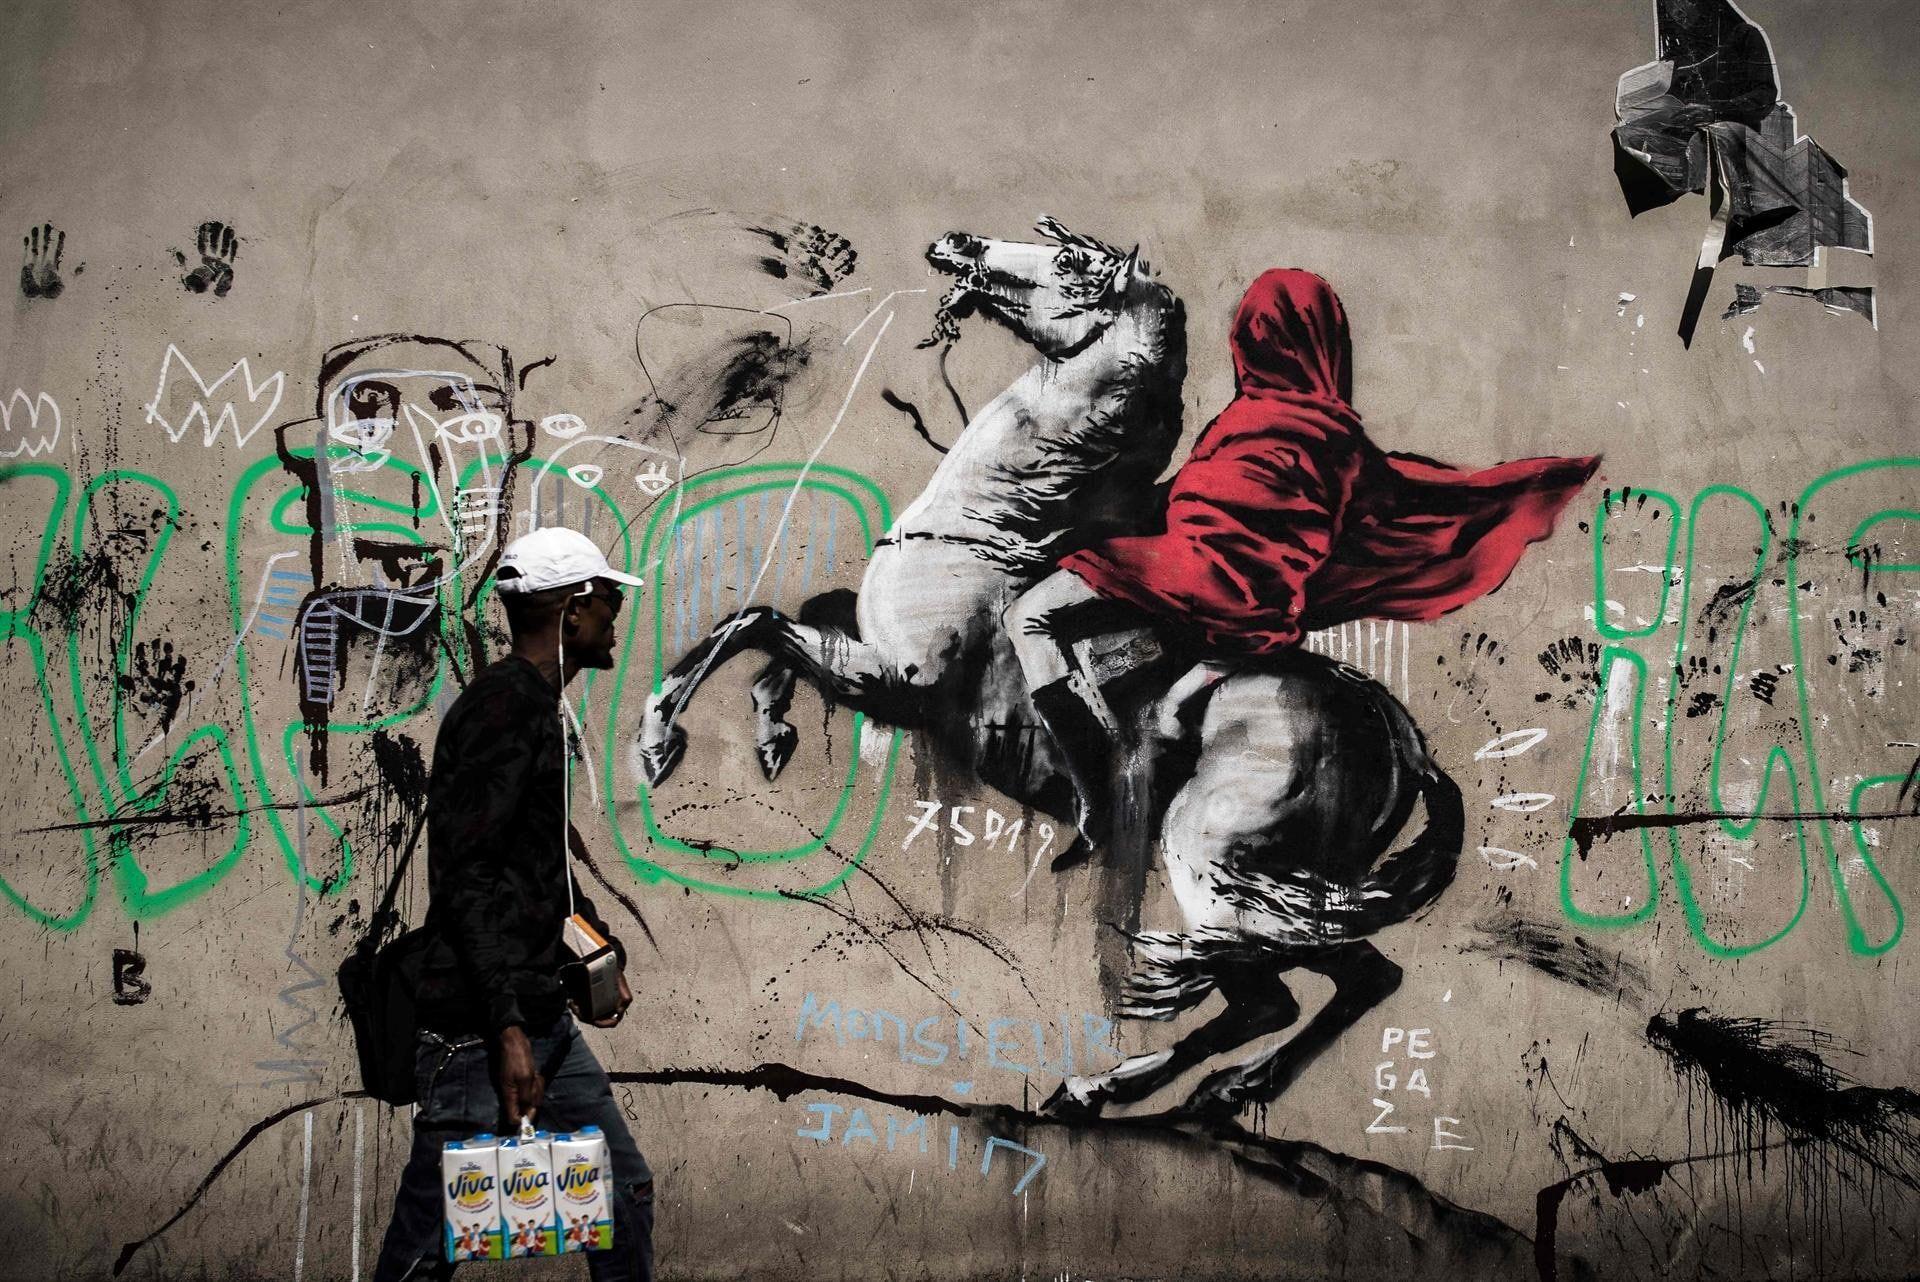 Banksy Graffiti Concrete Urban Horse Men Wall 1080p Wallpaper Hdwallpaper Desktop In 2020 Banksy Street Art Banksy Artwork